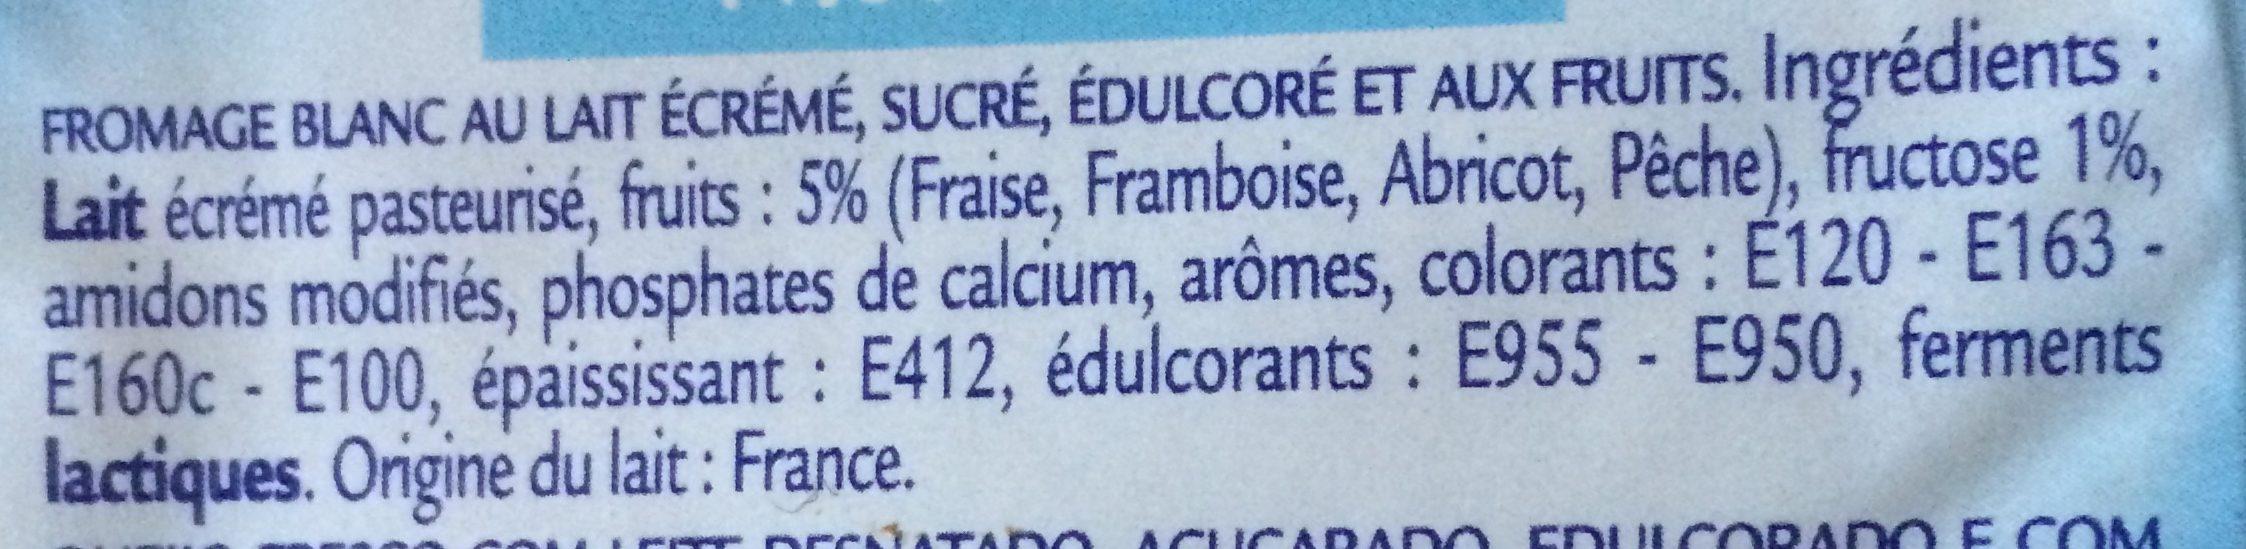 Fromage Frais aux Fruits 0% MG - Ingrediënten - fr